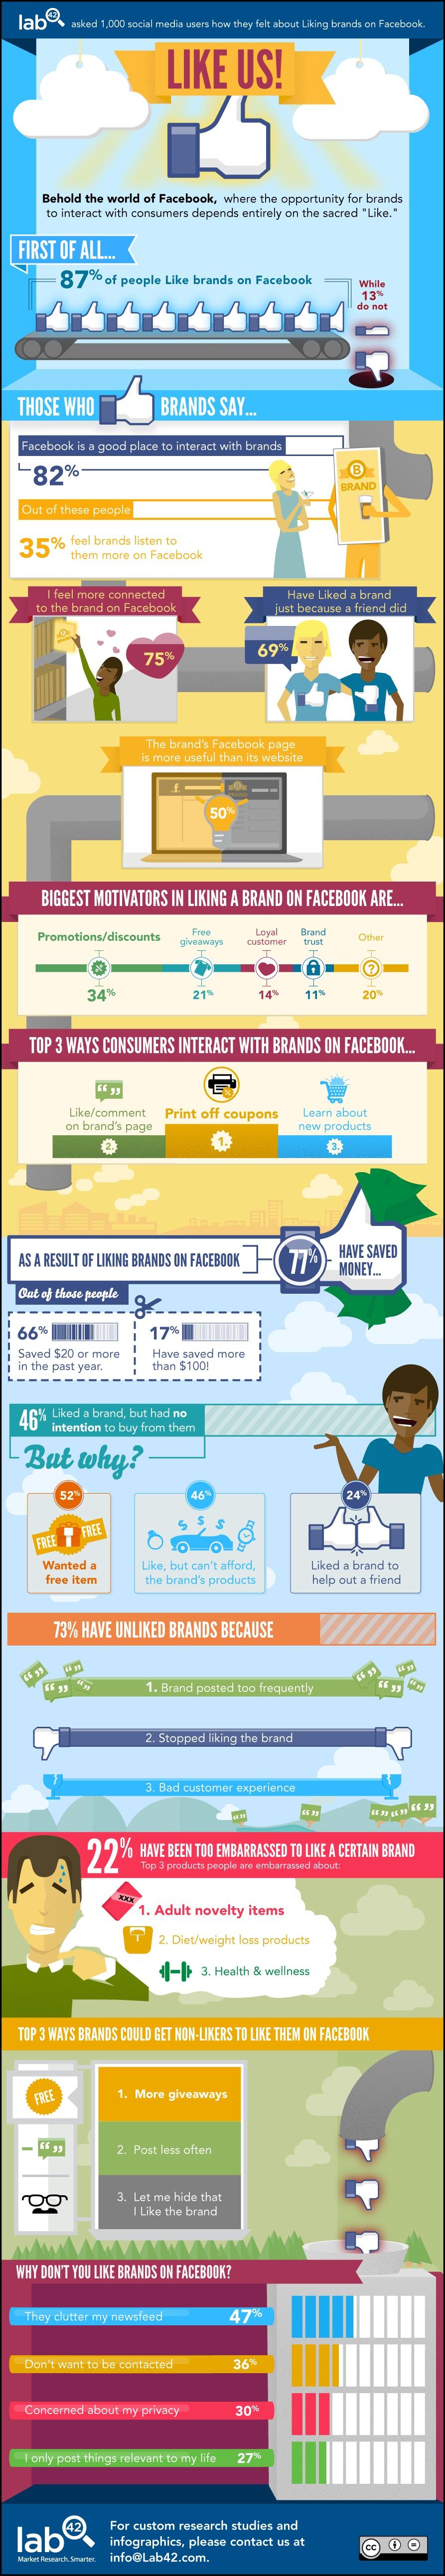 BrandsInfographic - Source blog.Lab42.com - 50% value your Facebook Page over your Website